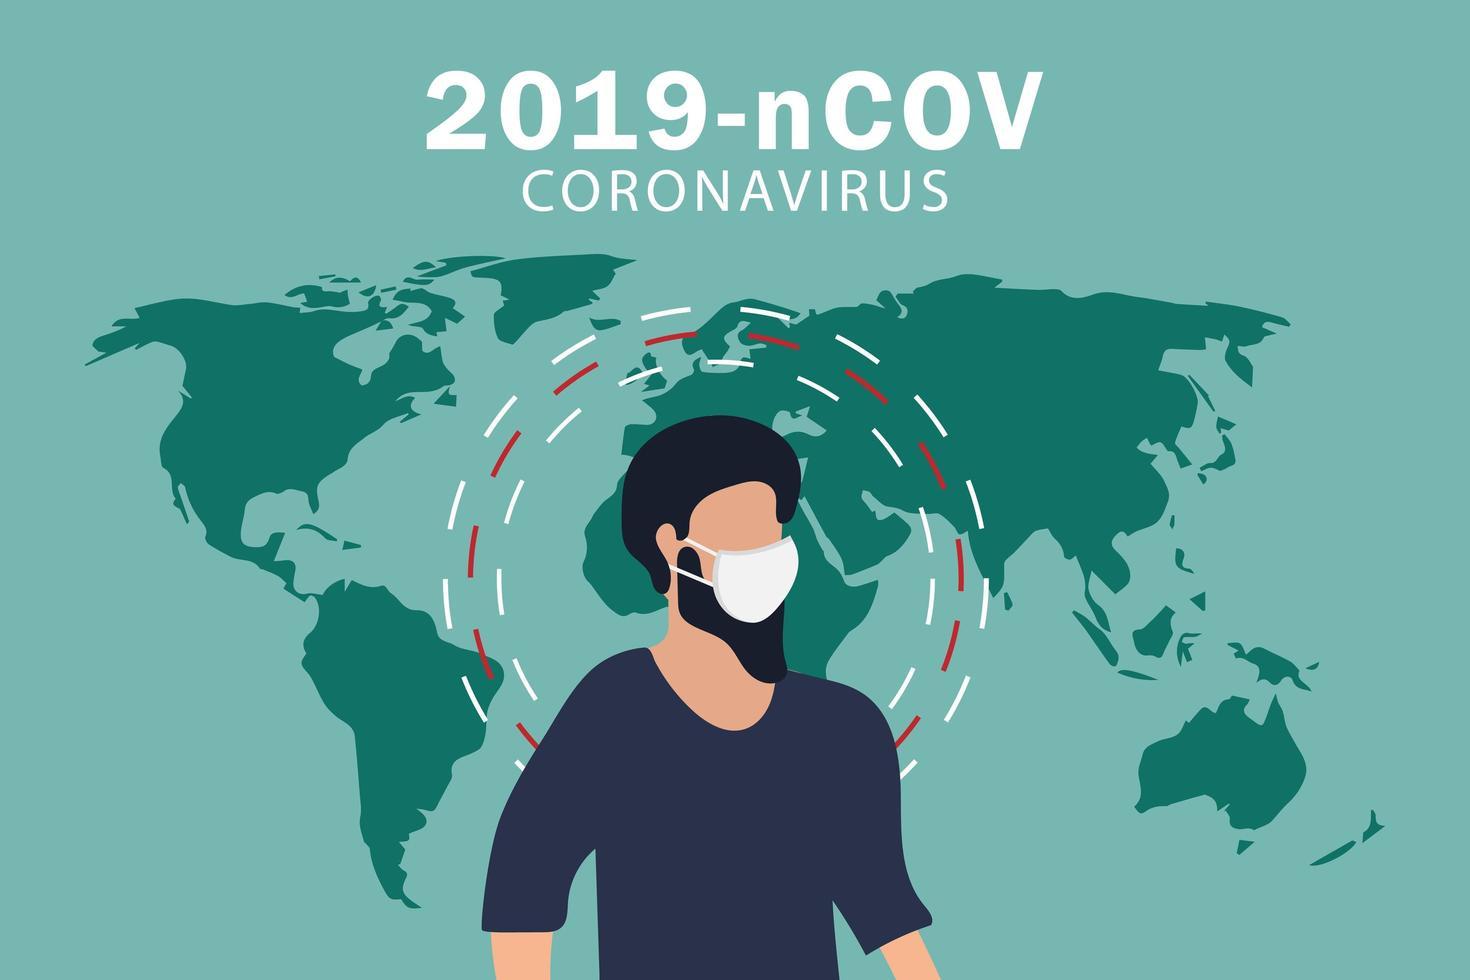 cartel de coronavirus covid-19 con hombre con mascarilla vector